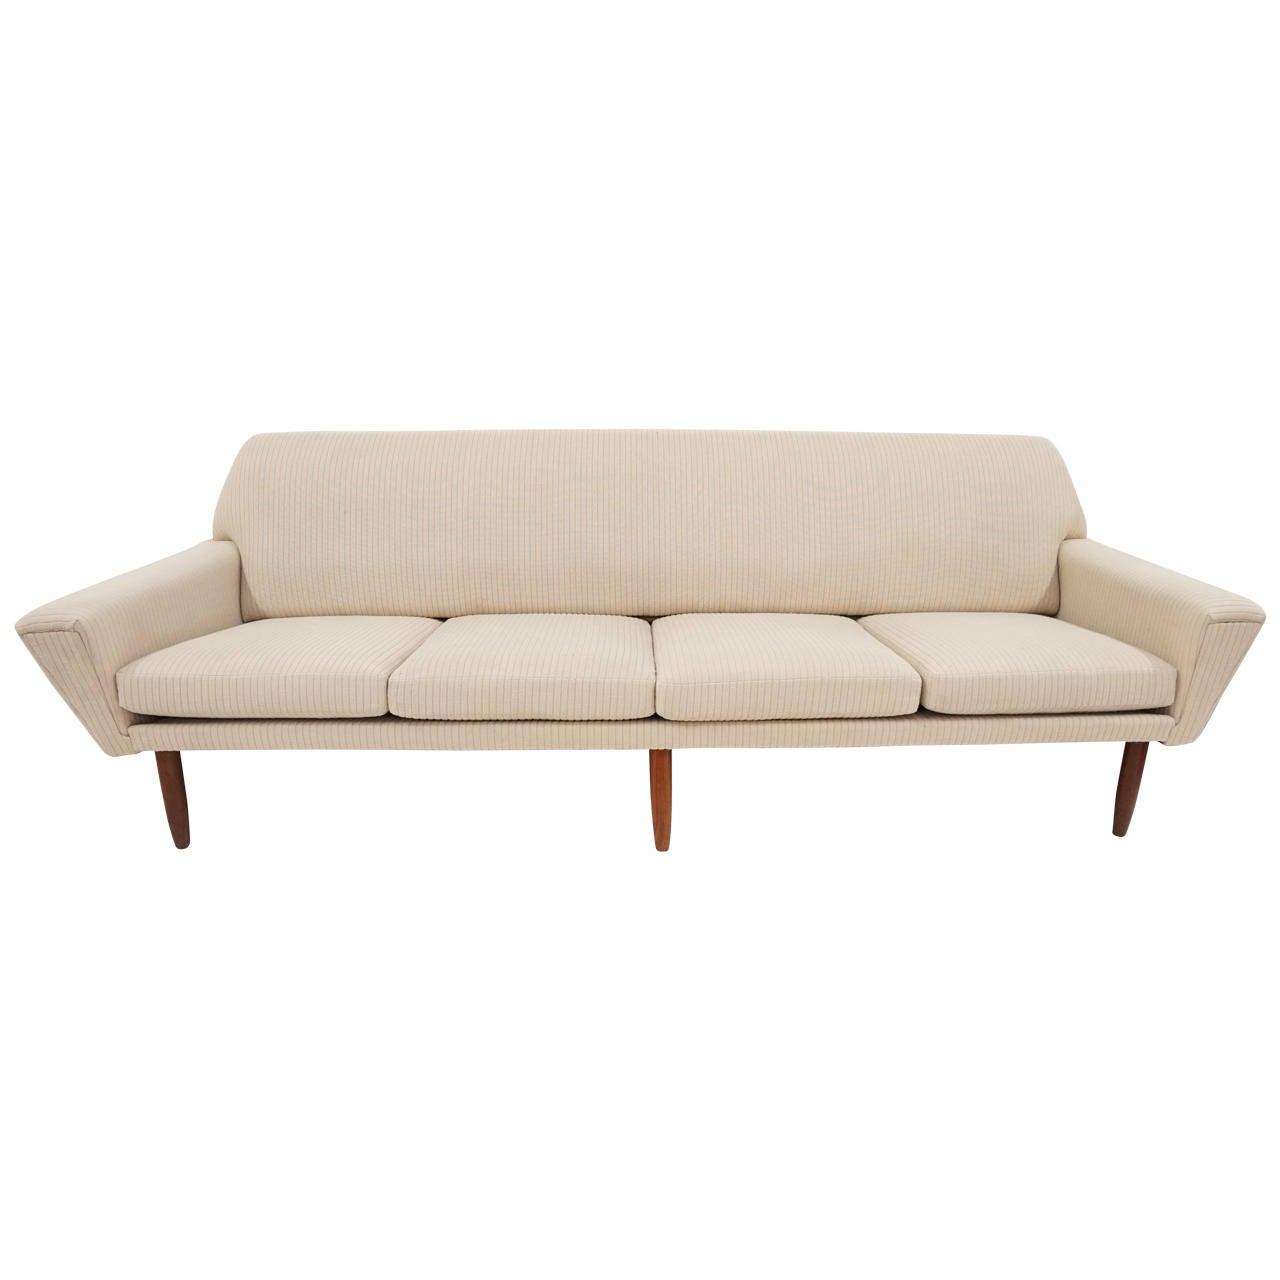 Danish Modern Sofas: Danish Modern Sofa At 1stdibs